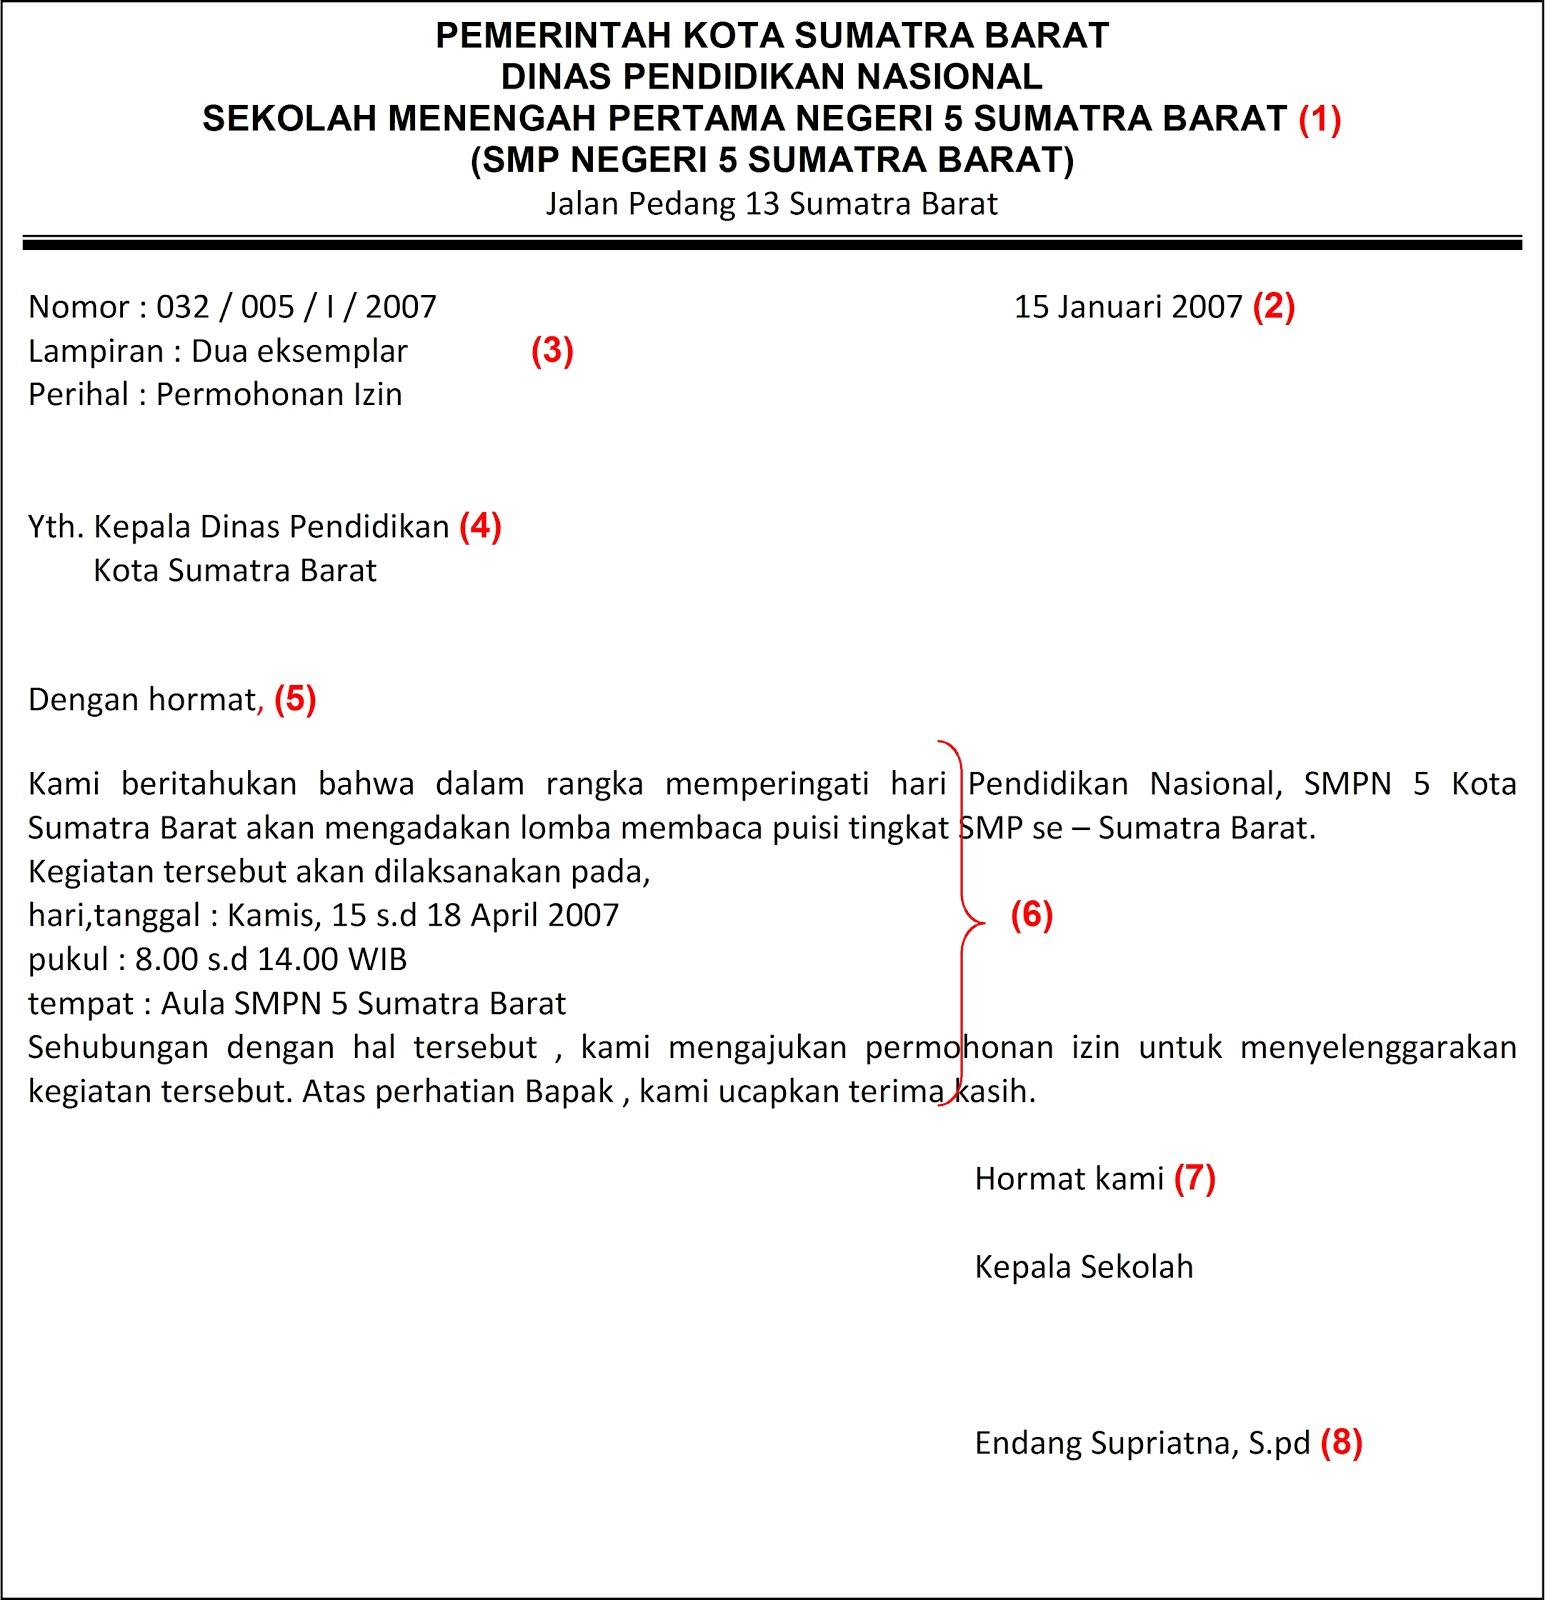 Seputar Bahasa Indonesia: Materi Kelas 8 Bhs Indonesia KD 4.2